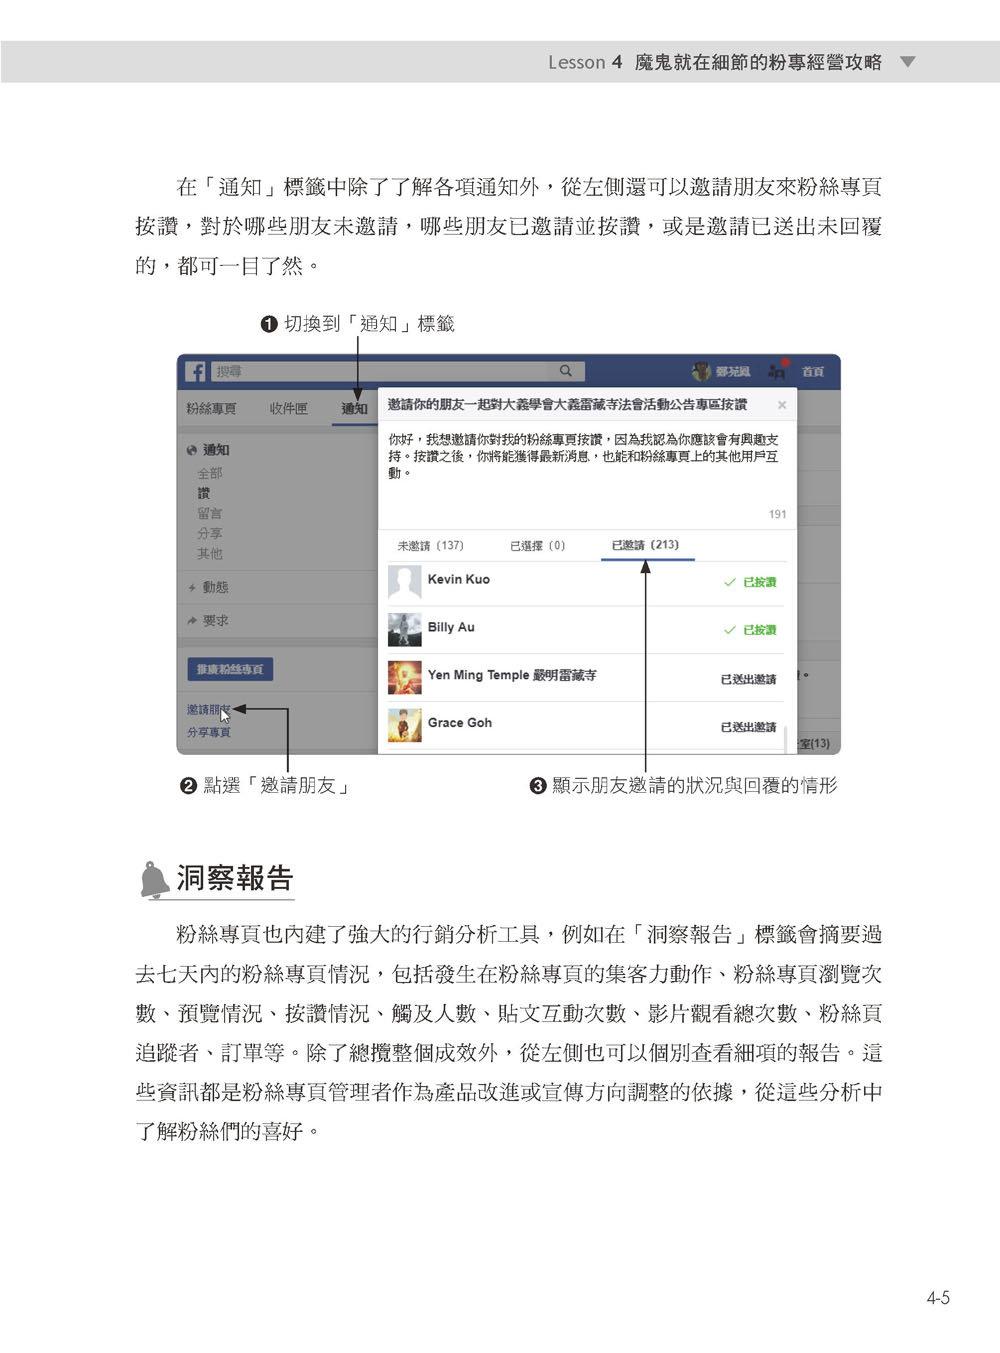 Facebook 互動行銷:社群口碑經營新思路+廣告投放如何有成效,想做好臉書行銷,操作心法就在這!-preview-33